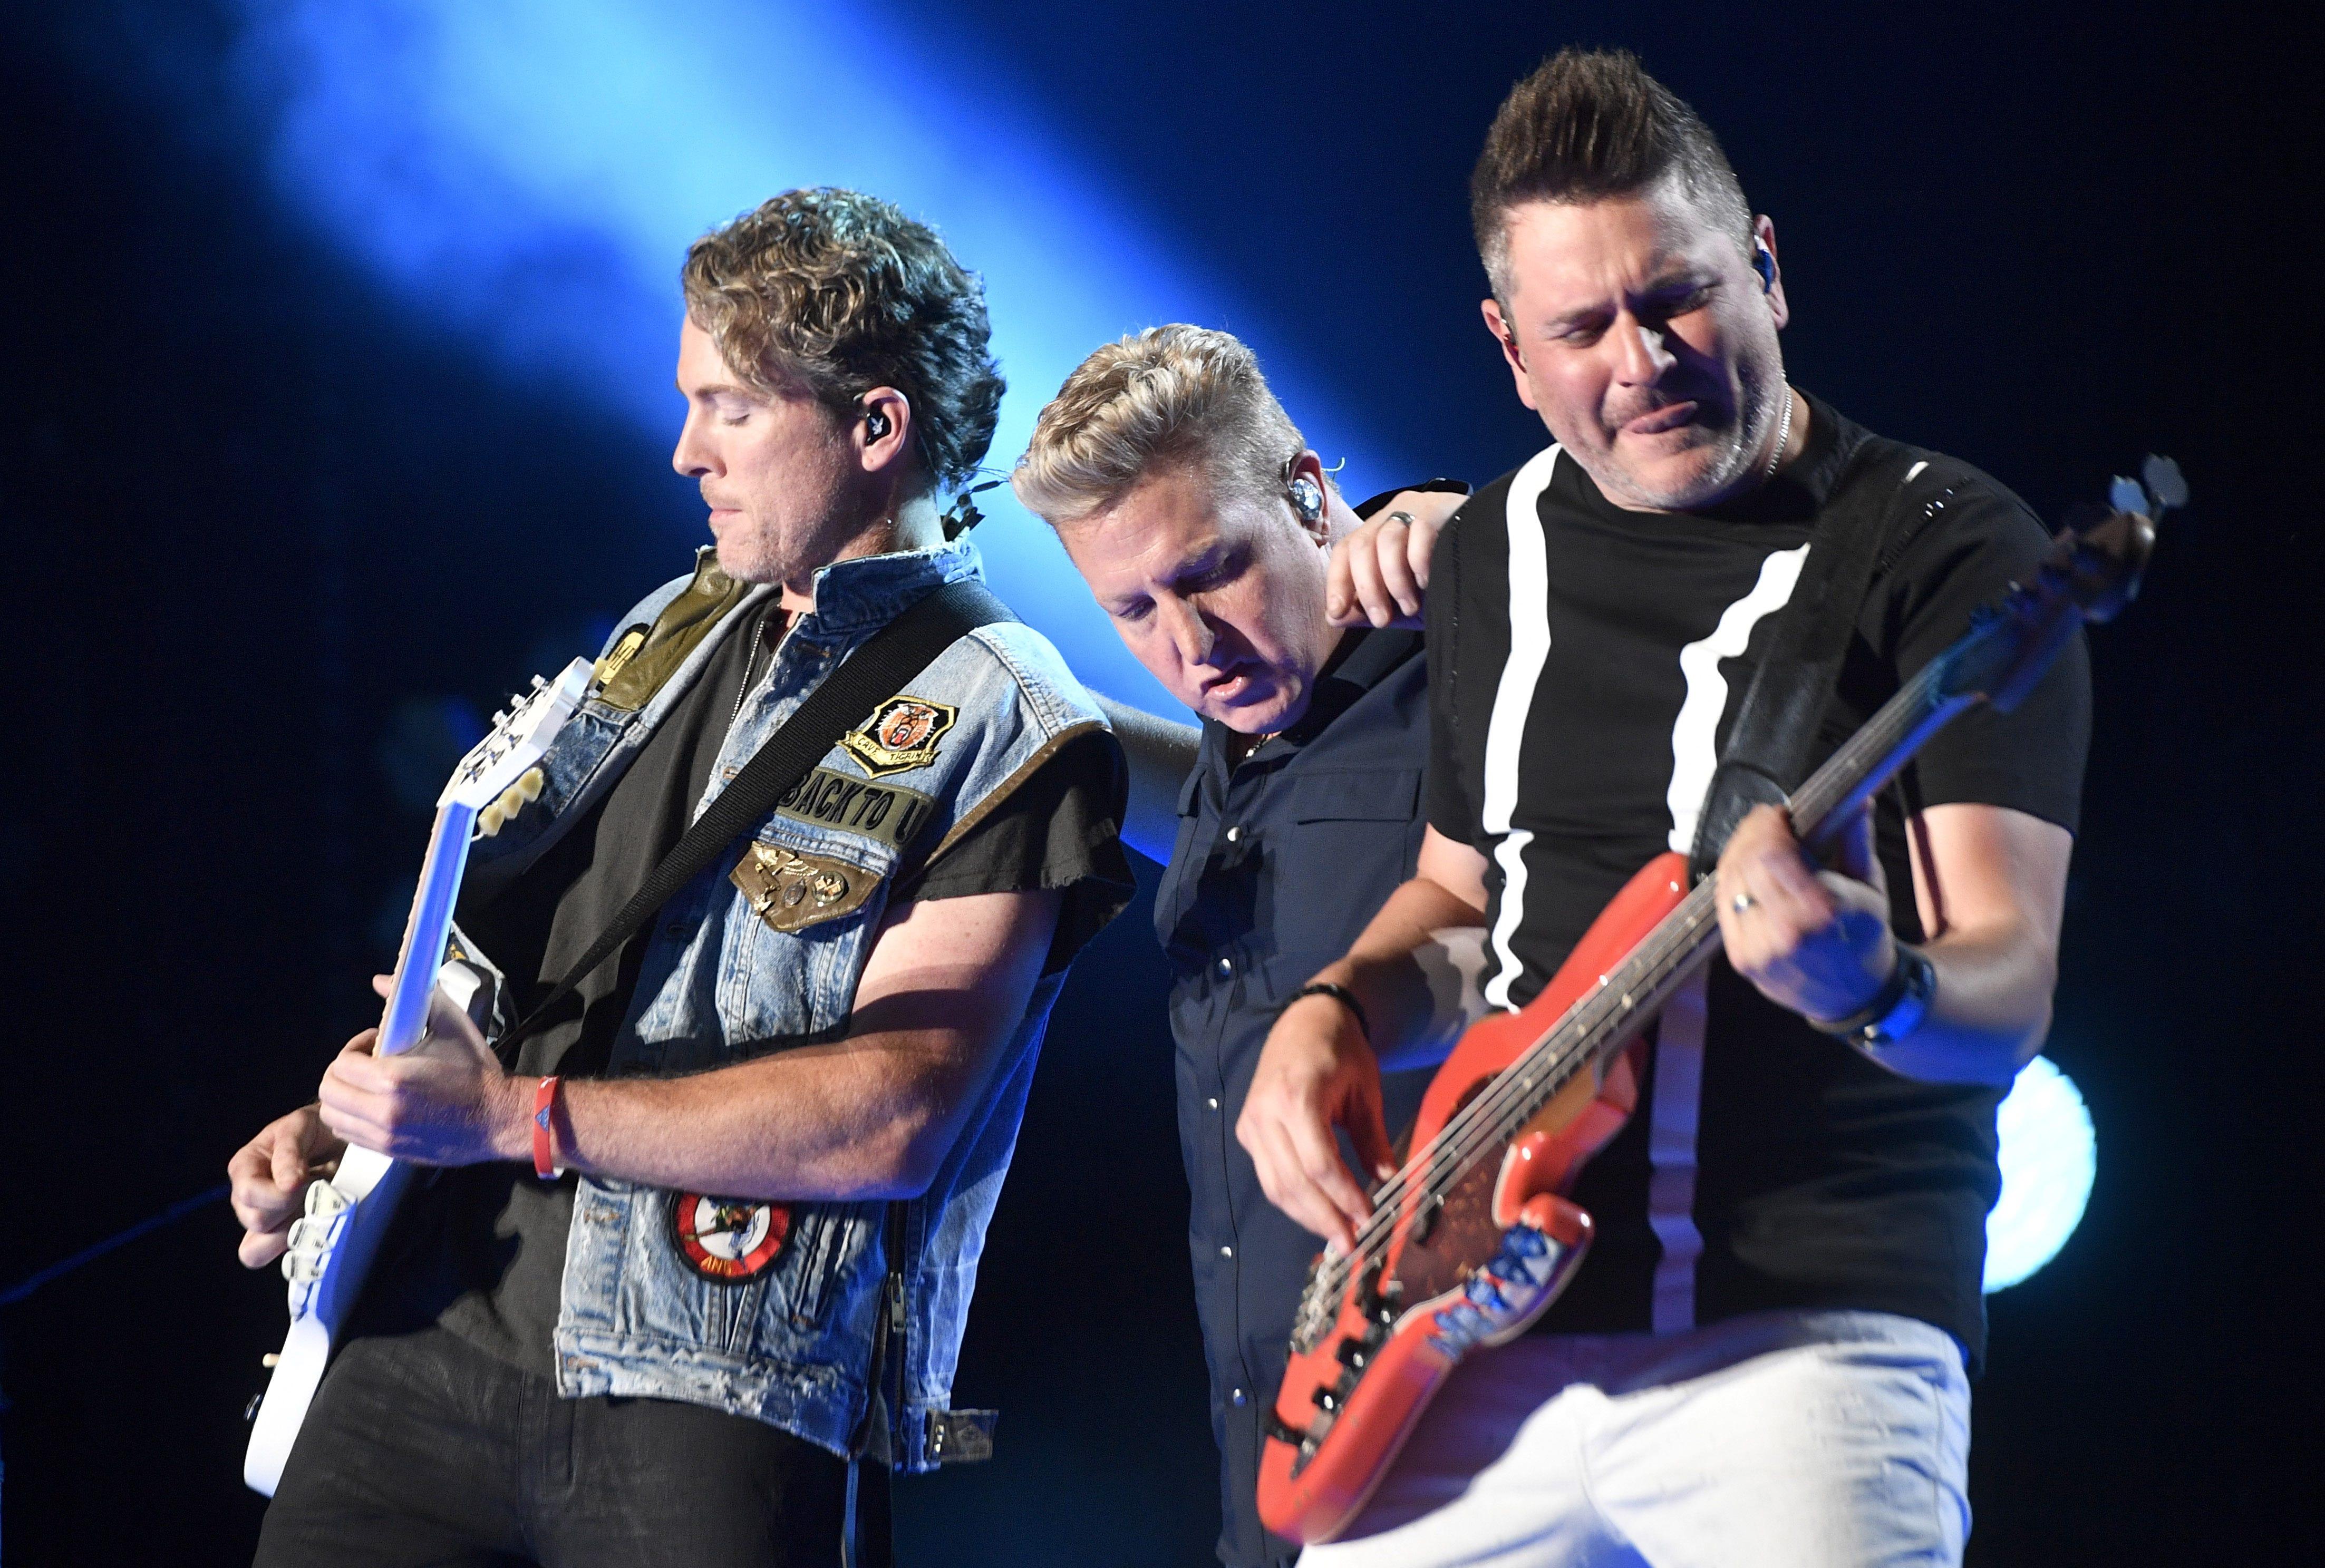 Concert announcements for Phoenix: Rascal Flatts, Wayne Newton, Bad Bunny, Kansas, ZZ Top